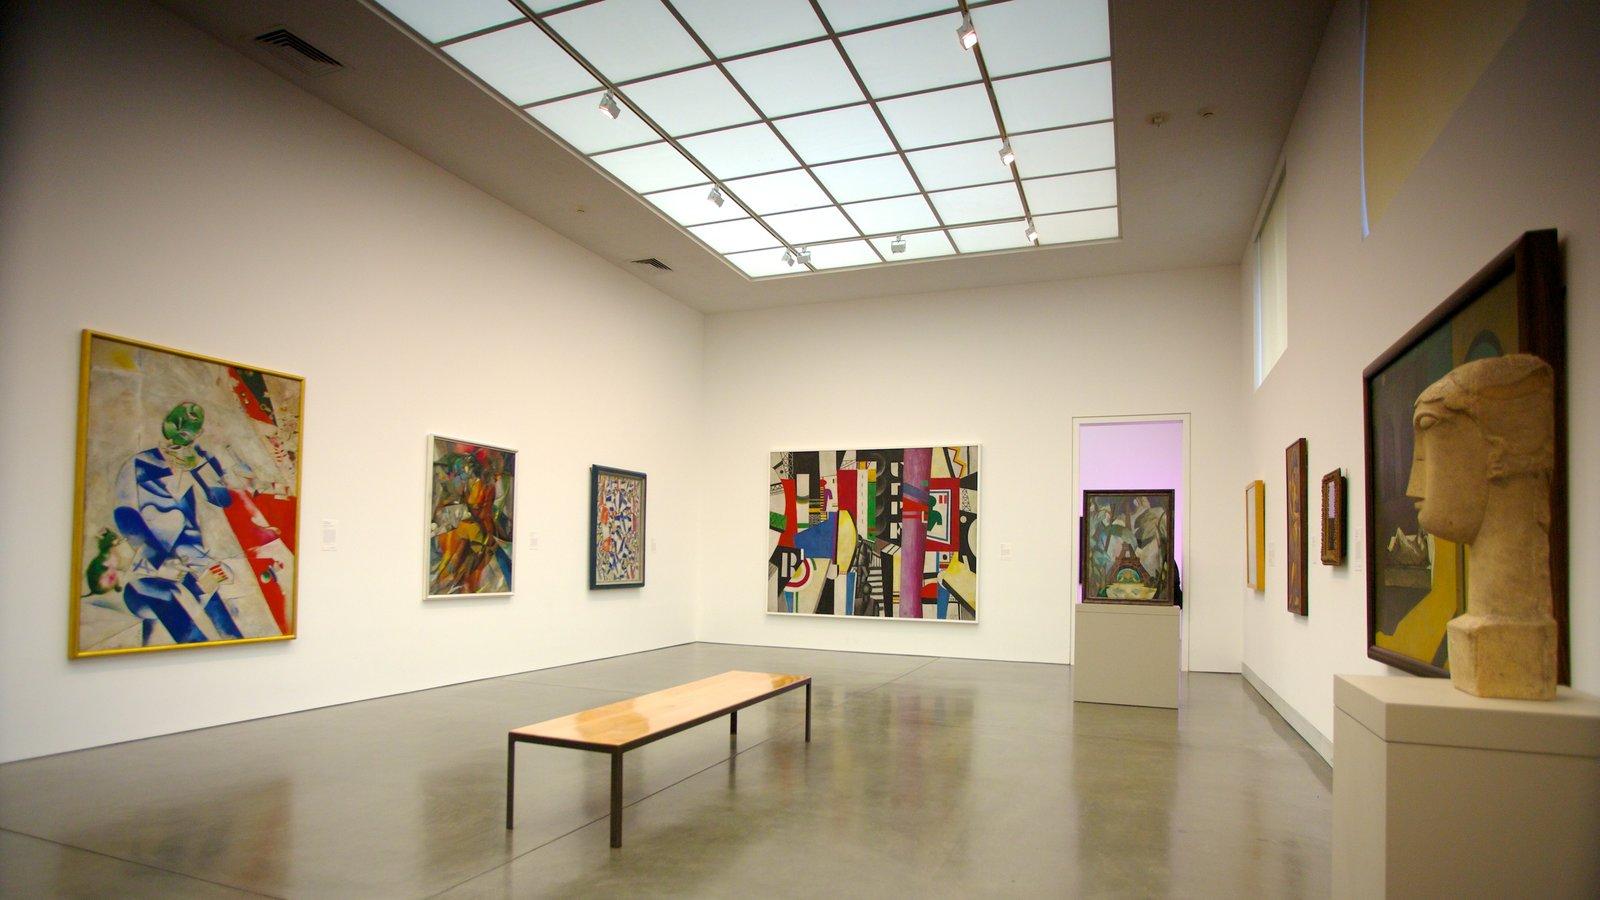 Philadelphia Museum of Art mostrando vistas interiores y arte